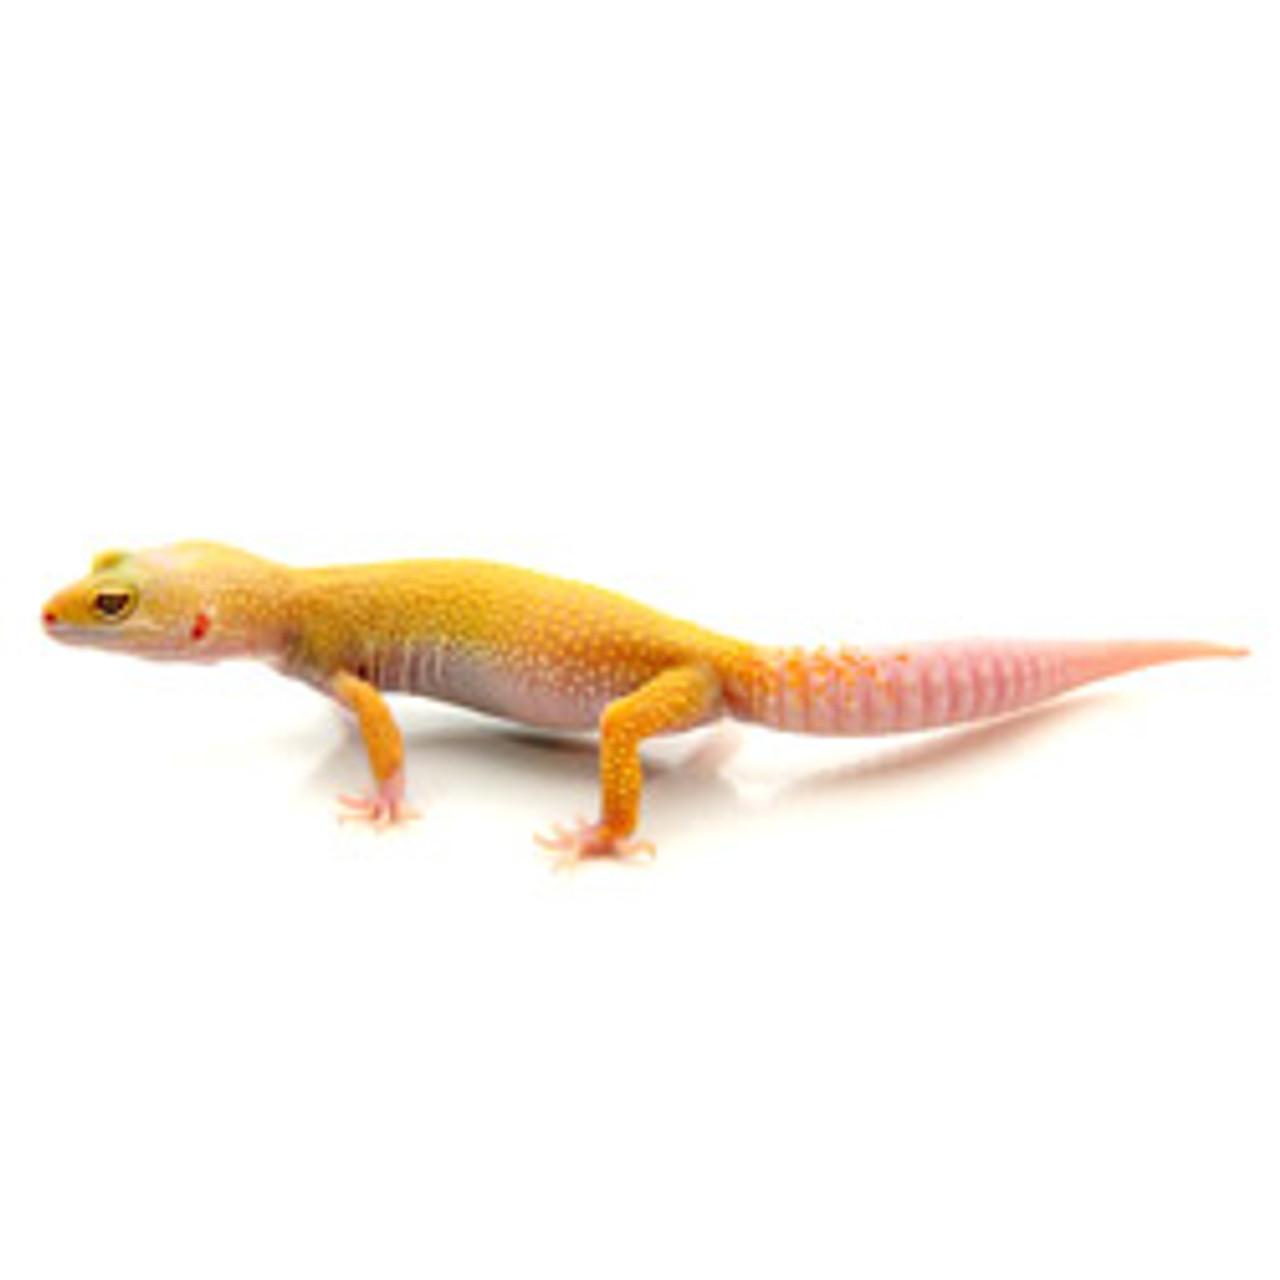 Albino Leucistic Leopard Gecko (Eublepharis macularius) BABY